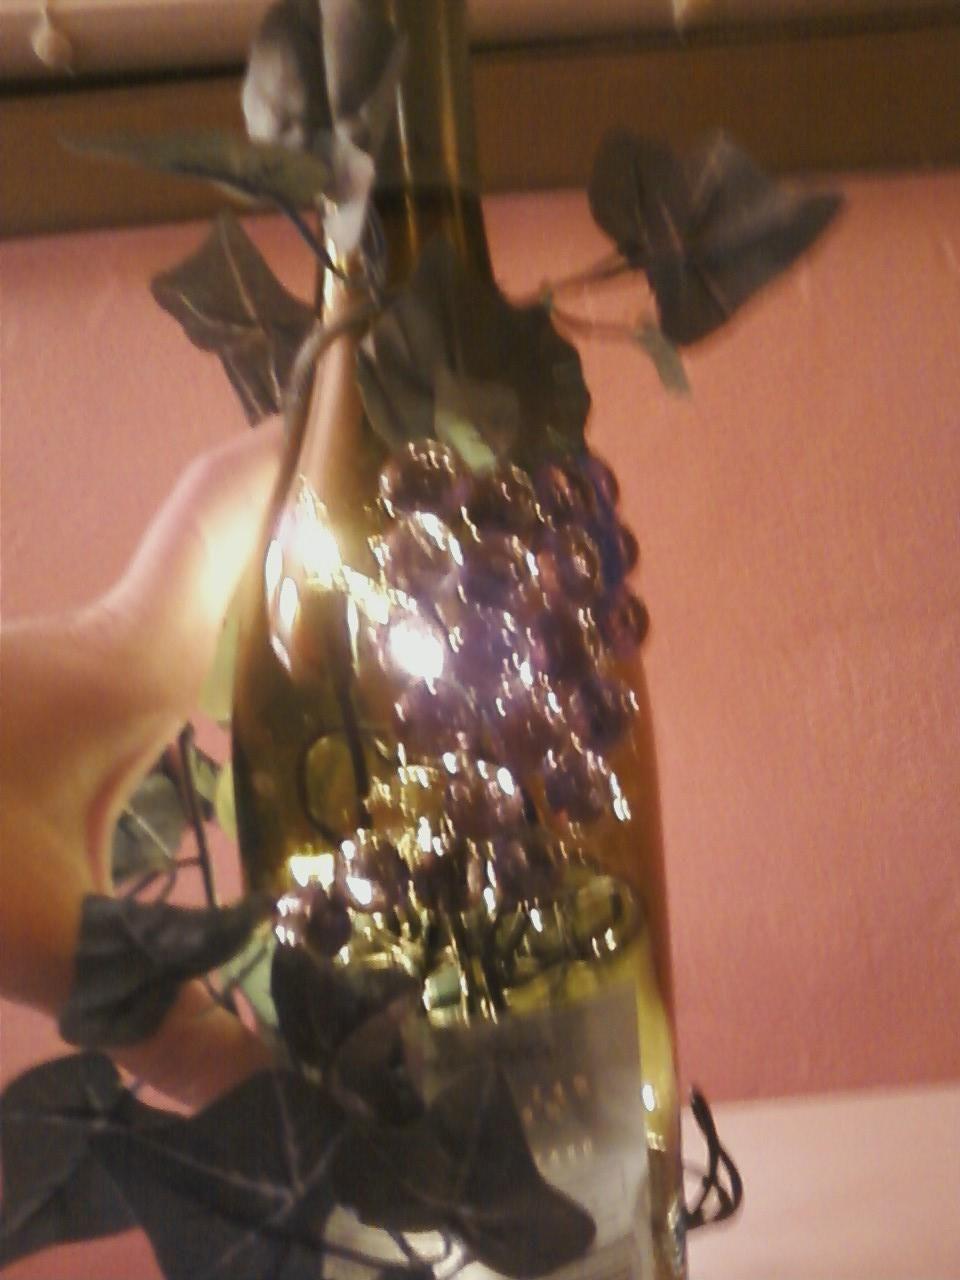 Wine glass light, Tanner's grandma's idea :)